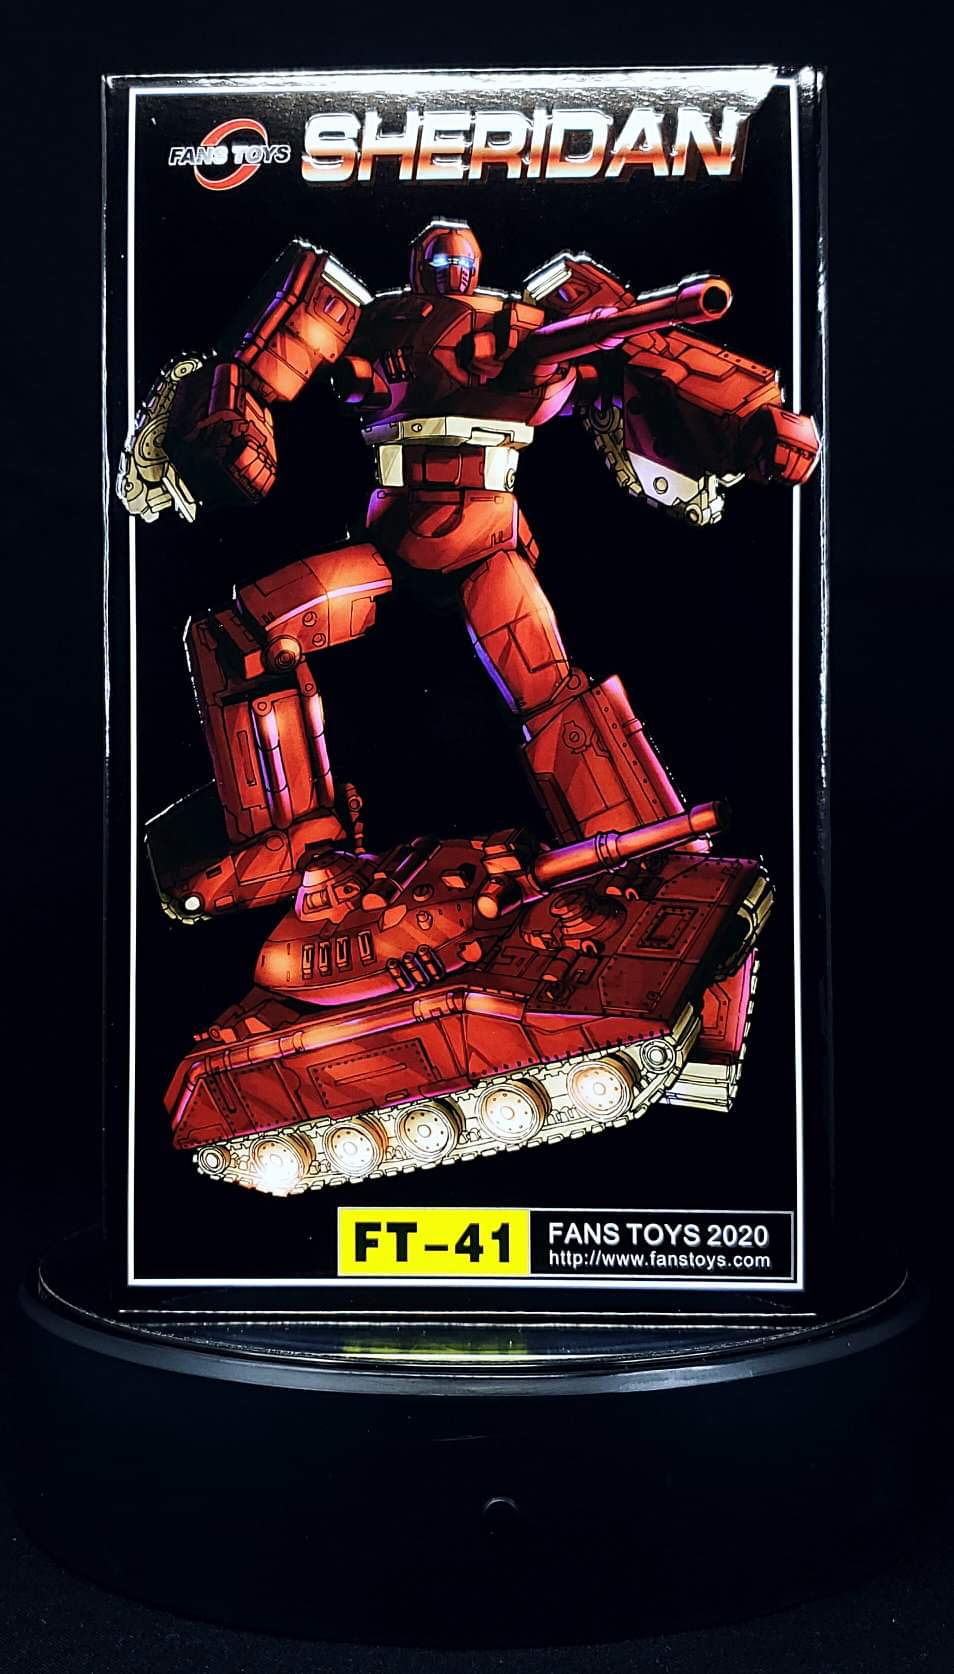 [Fanstoys] Produit Tiers - Minibots MP - Gamme FT - Page 5 UjzZ6R41_o